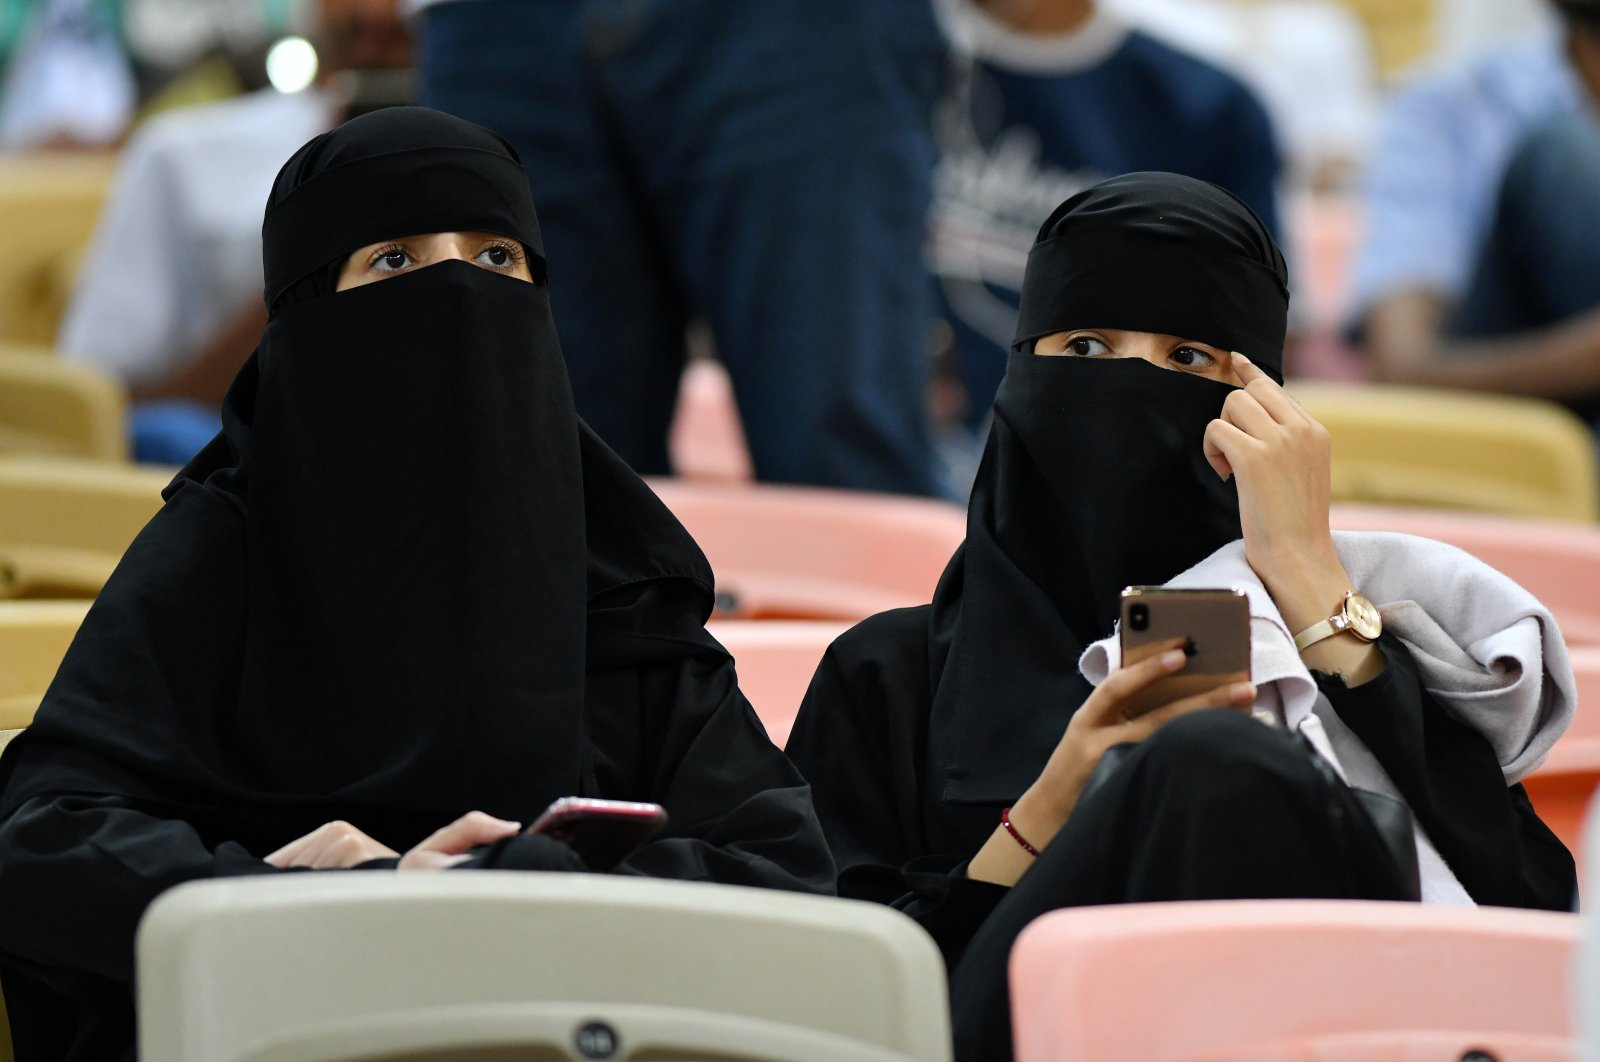 Women inside the stadium before the Spanish Super Cup semifinal – Valencia vs. Real Madrid match, Jeddah, Saudi Arabi, Jan. 8, 2020. (Reuters Photo)